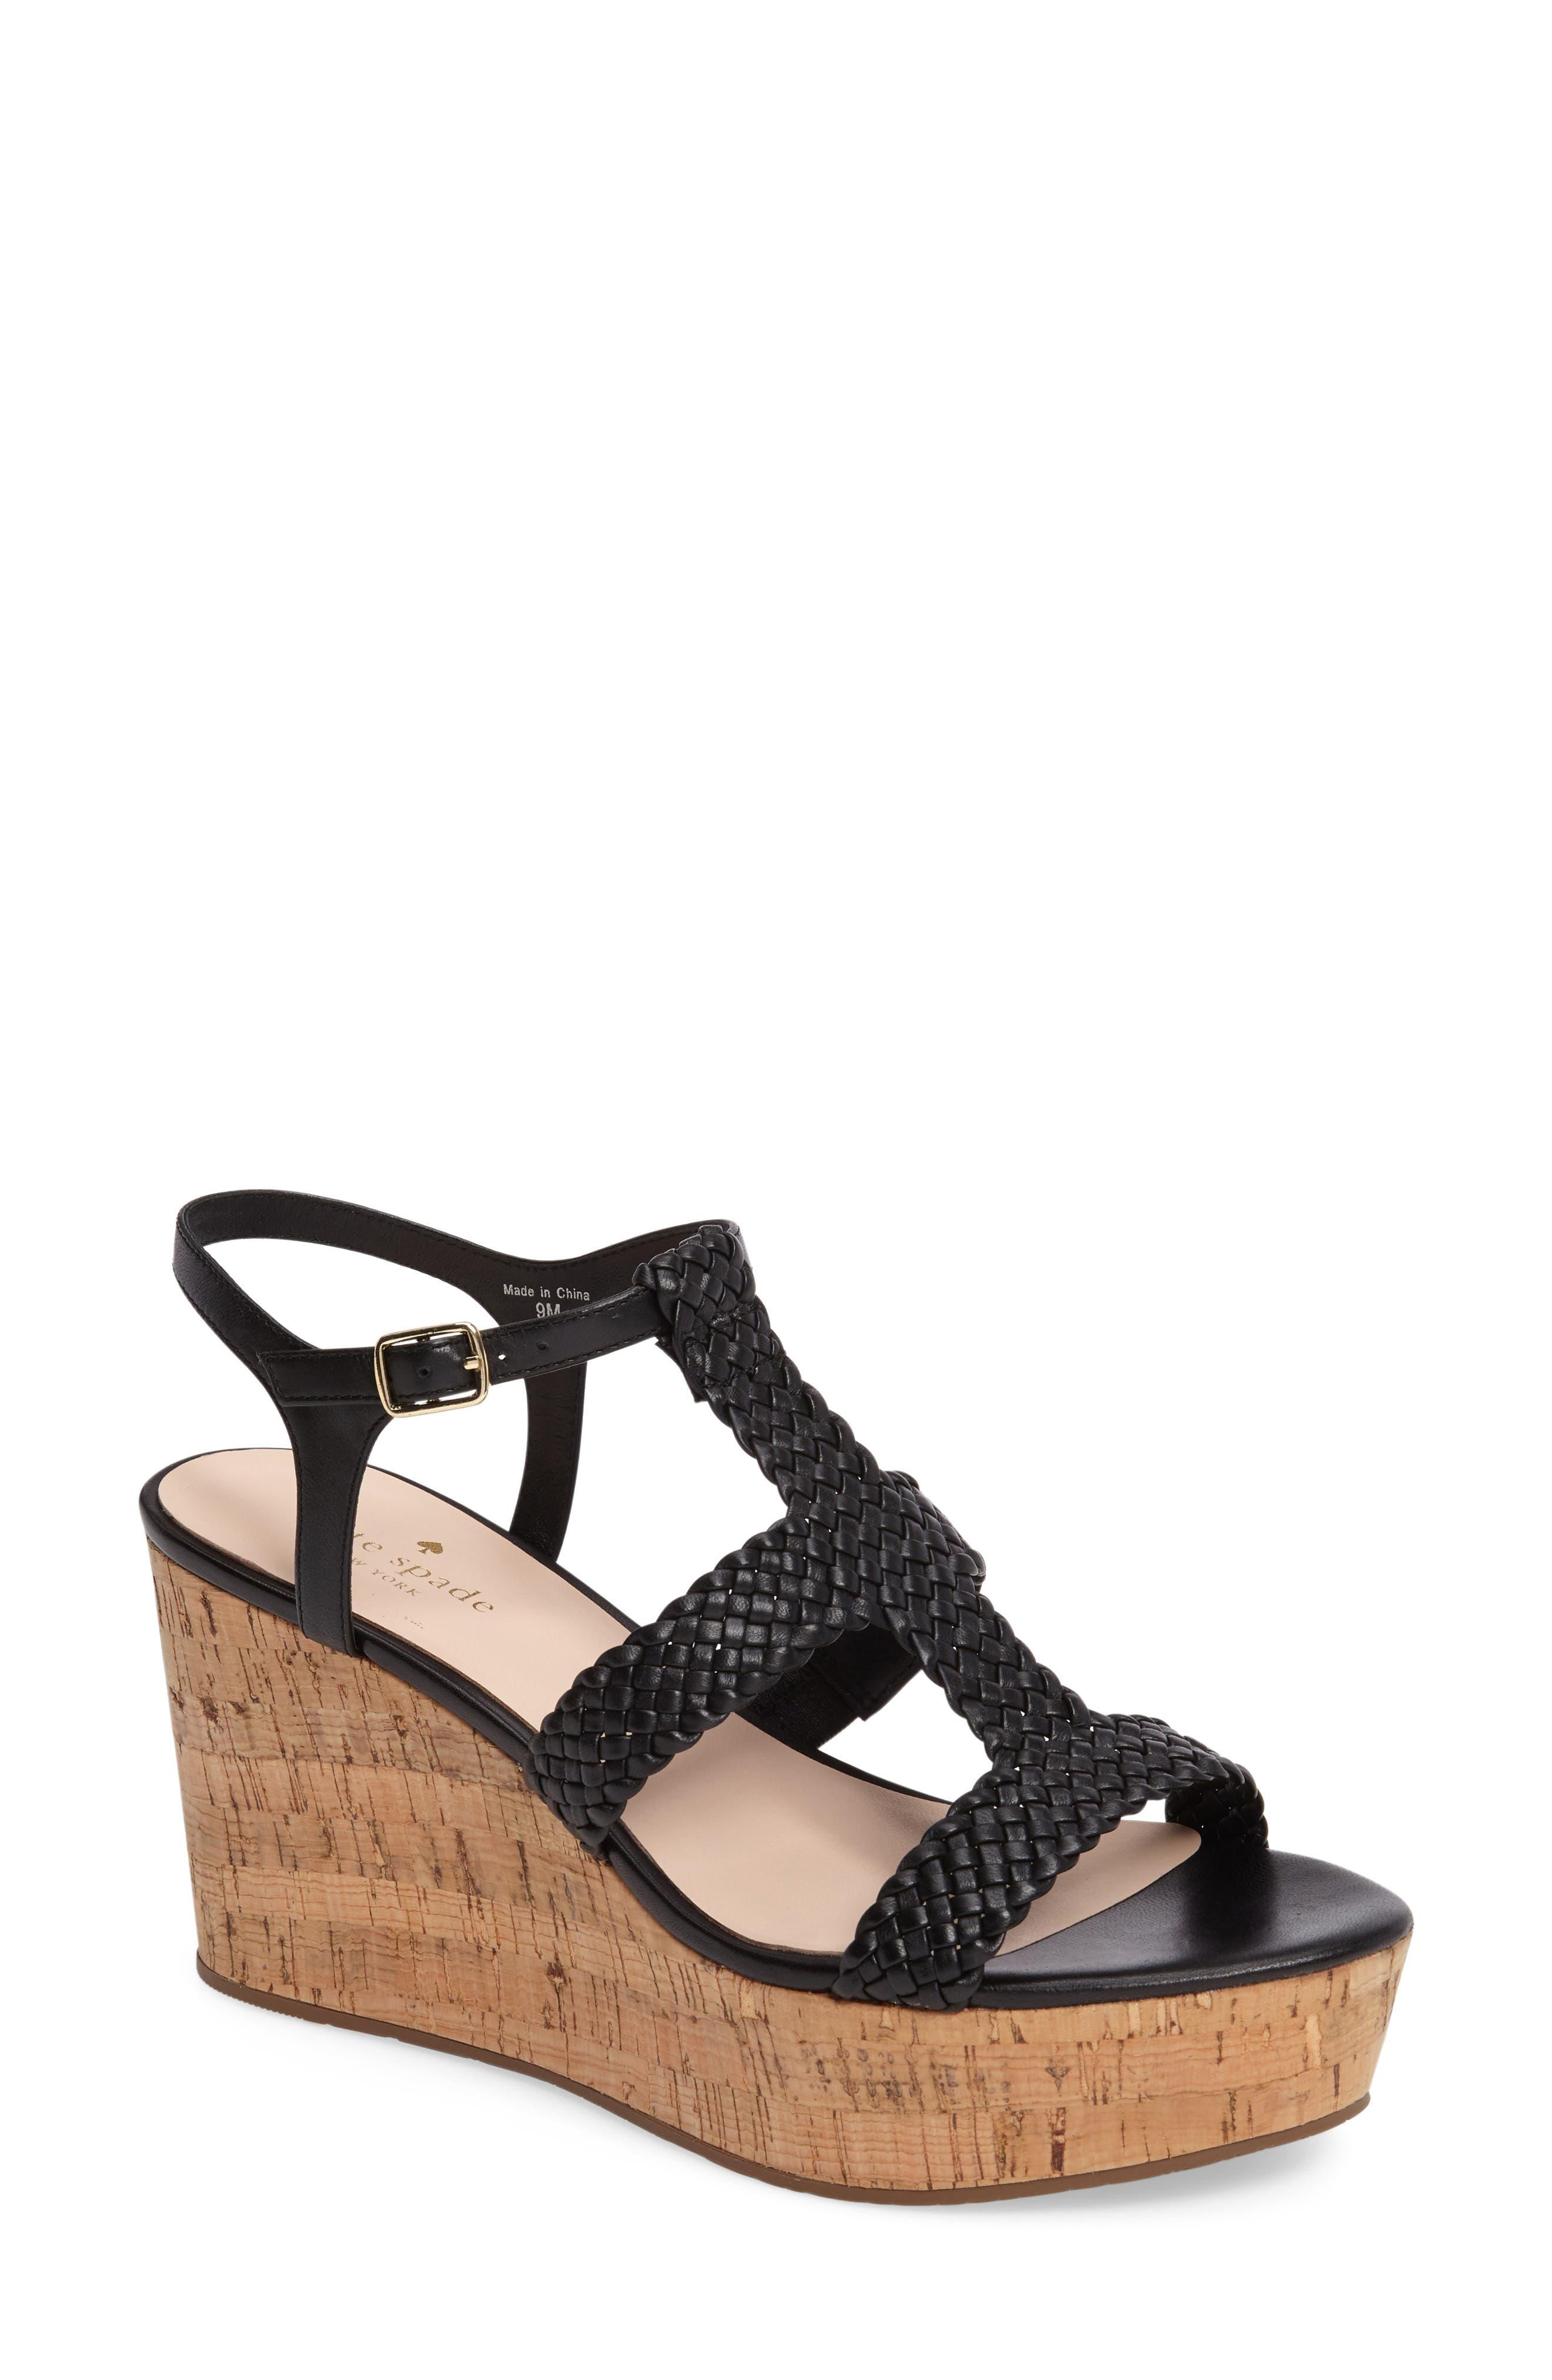 kate spade new york tianna platform sandal (Women)